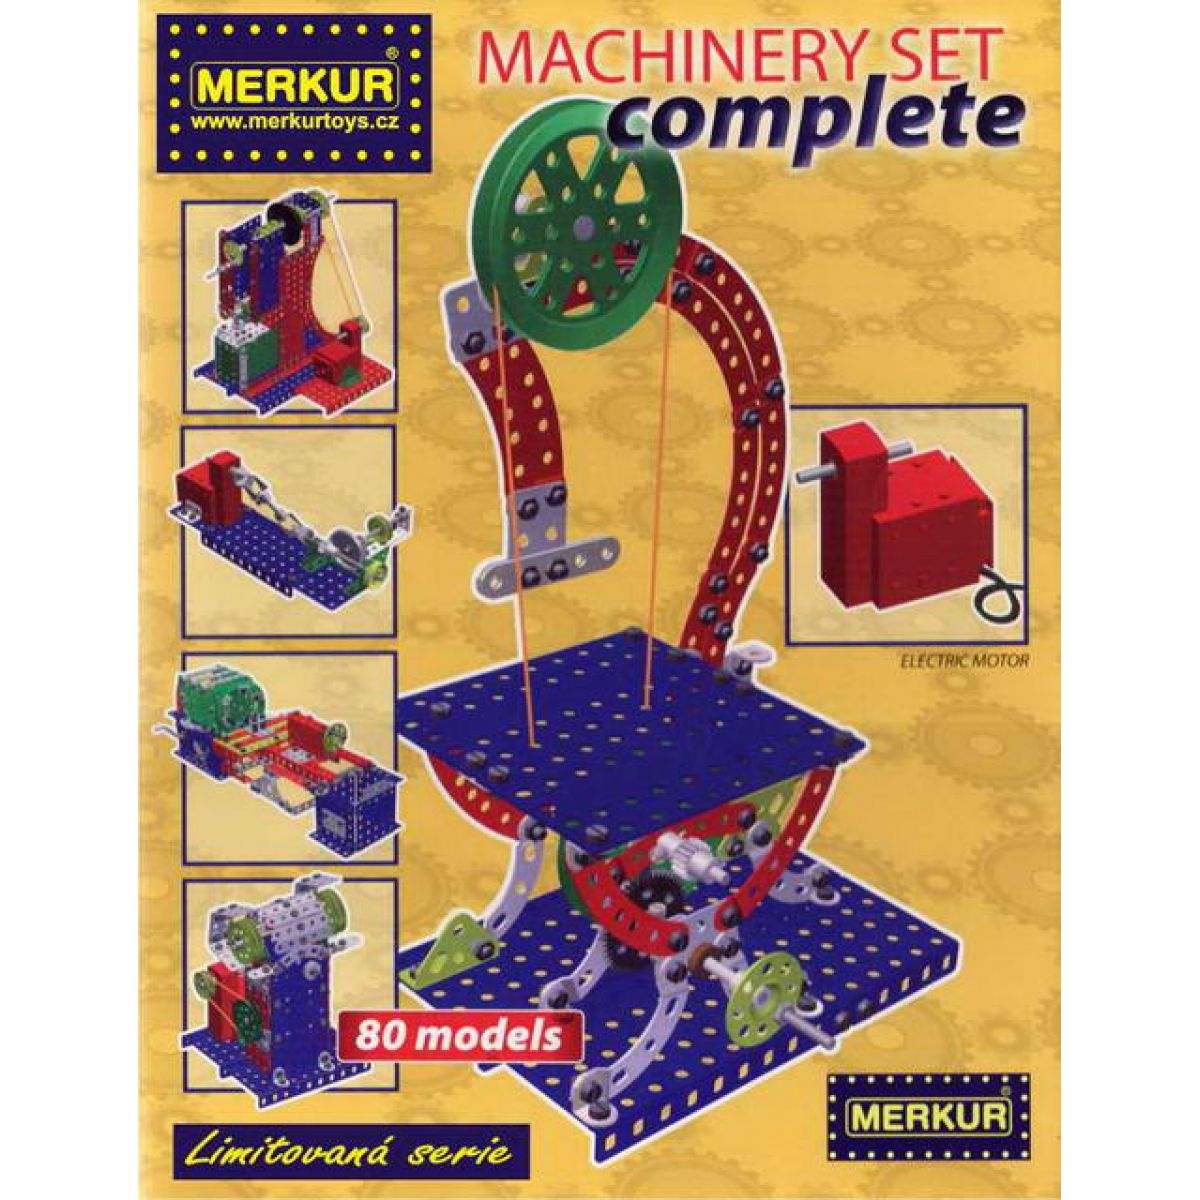 Merkur Machinery set Complete 80 modelů